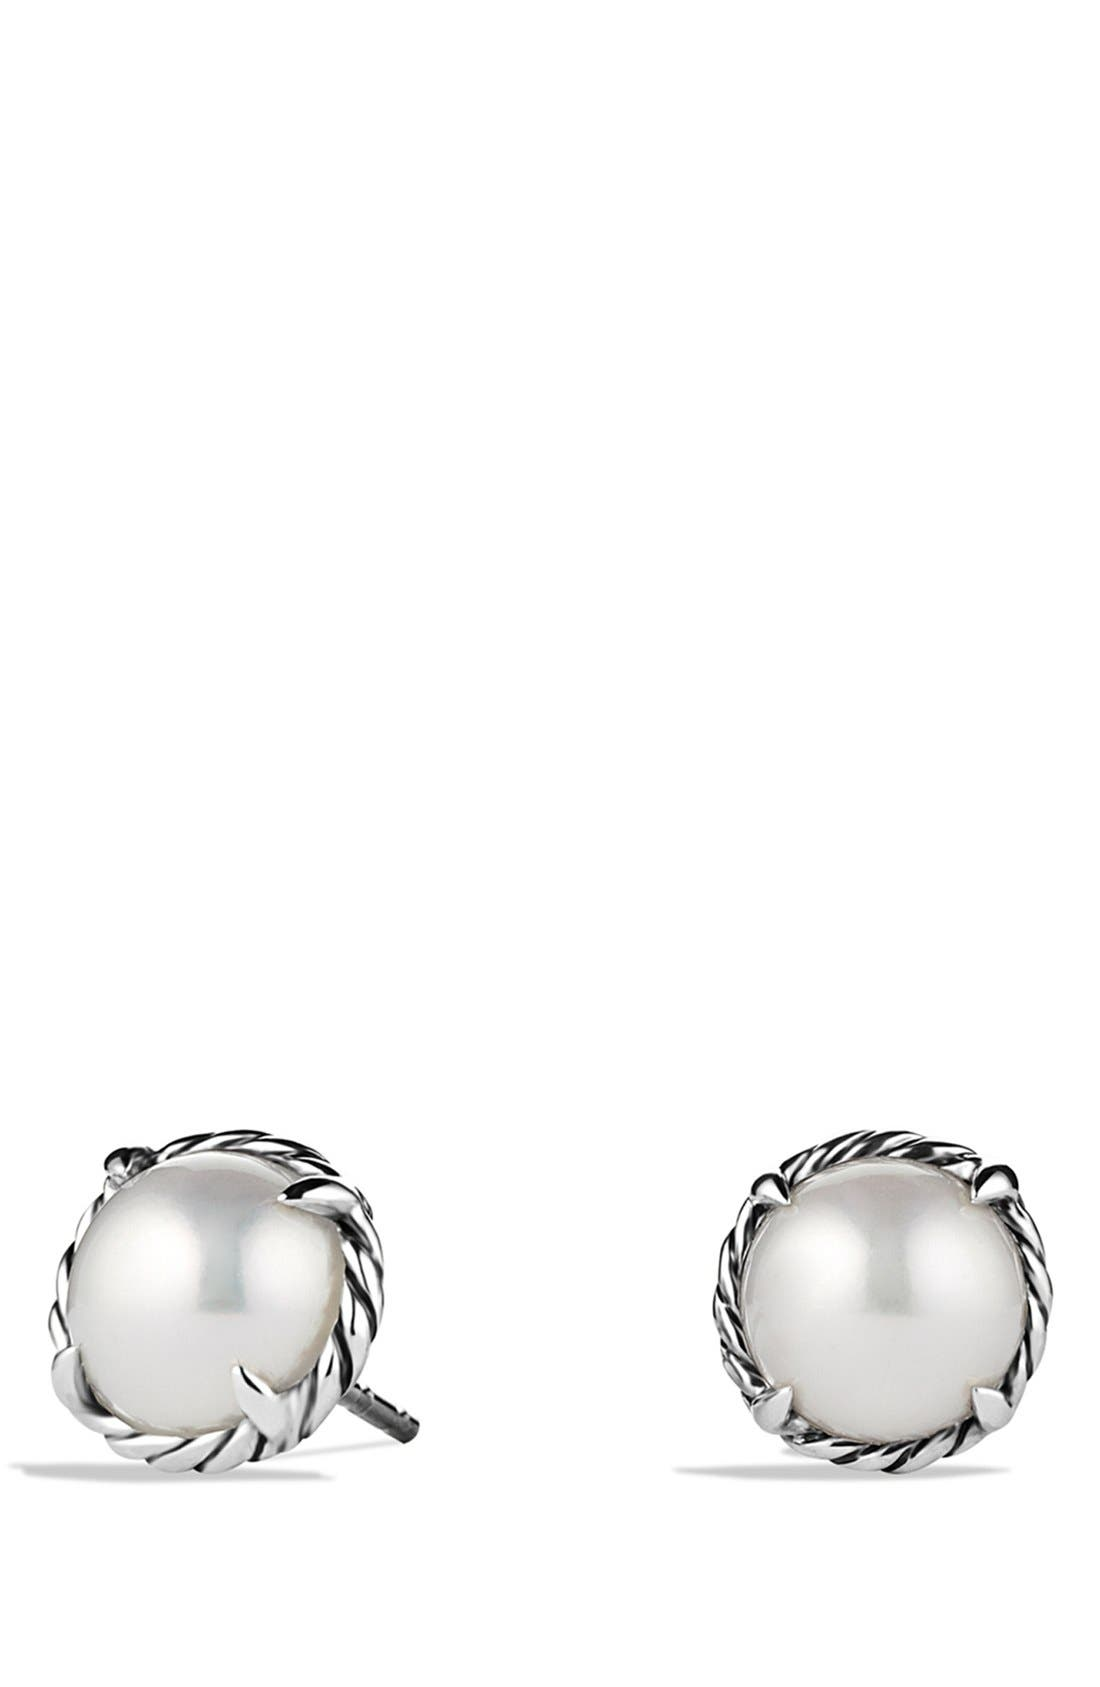 DAVID YURMAN Châtelaine Earrings